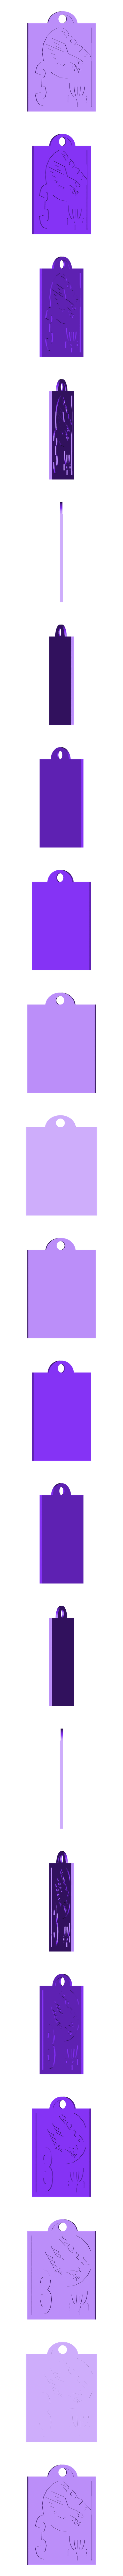 Disc_Bag_Tag_3.stl Download free STL file Disc Golf Bag Tag • 3D print design, mrhers2